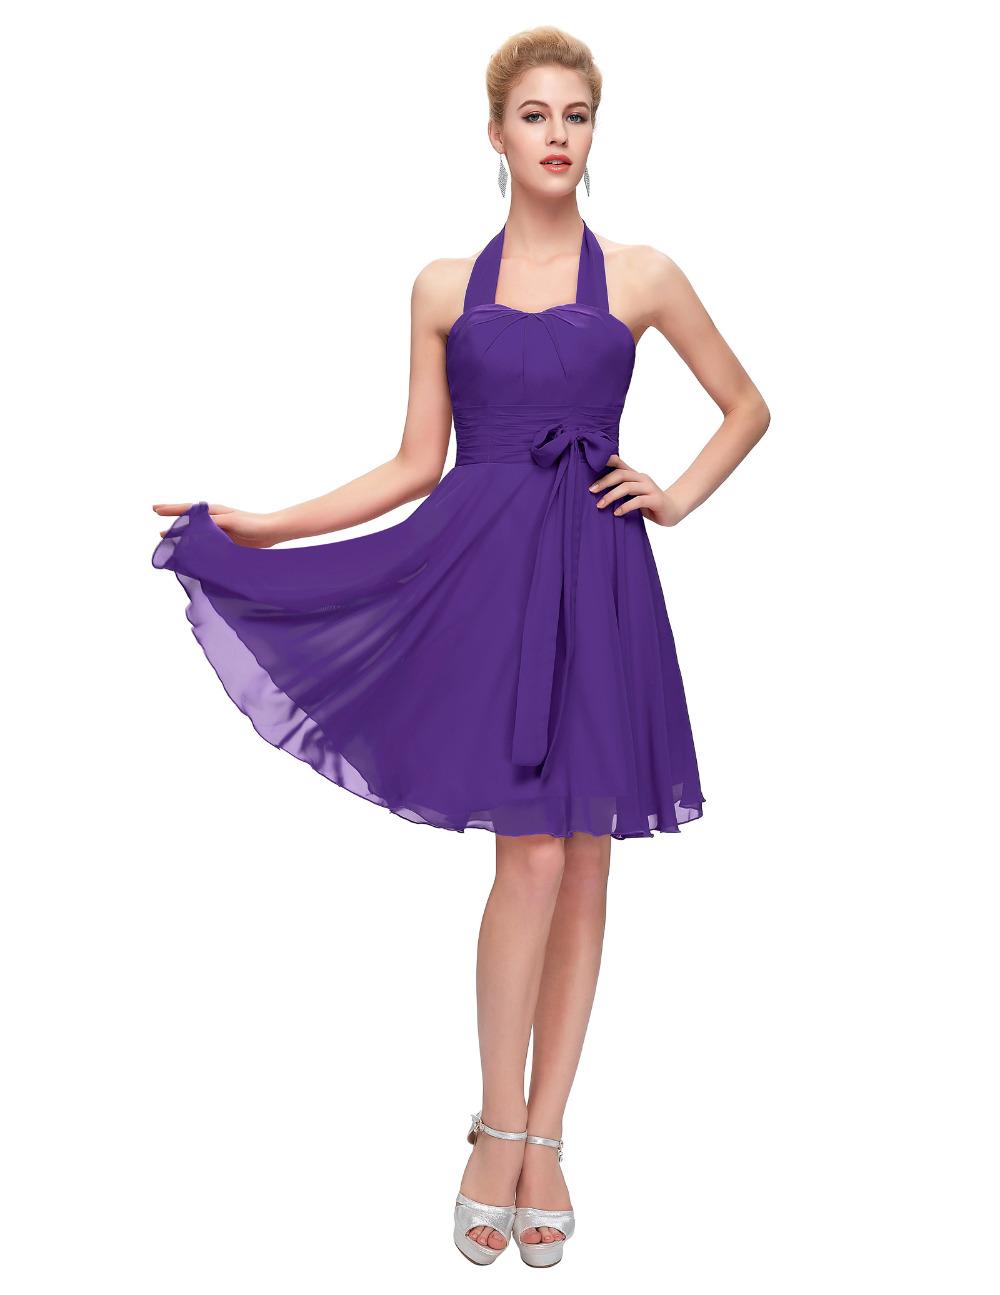 Bridesmaid Dresses Under 40 - Dress Ala